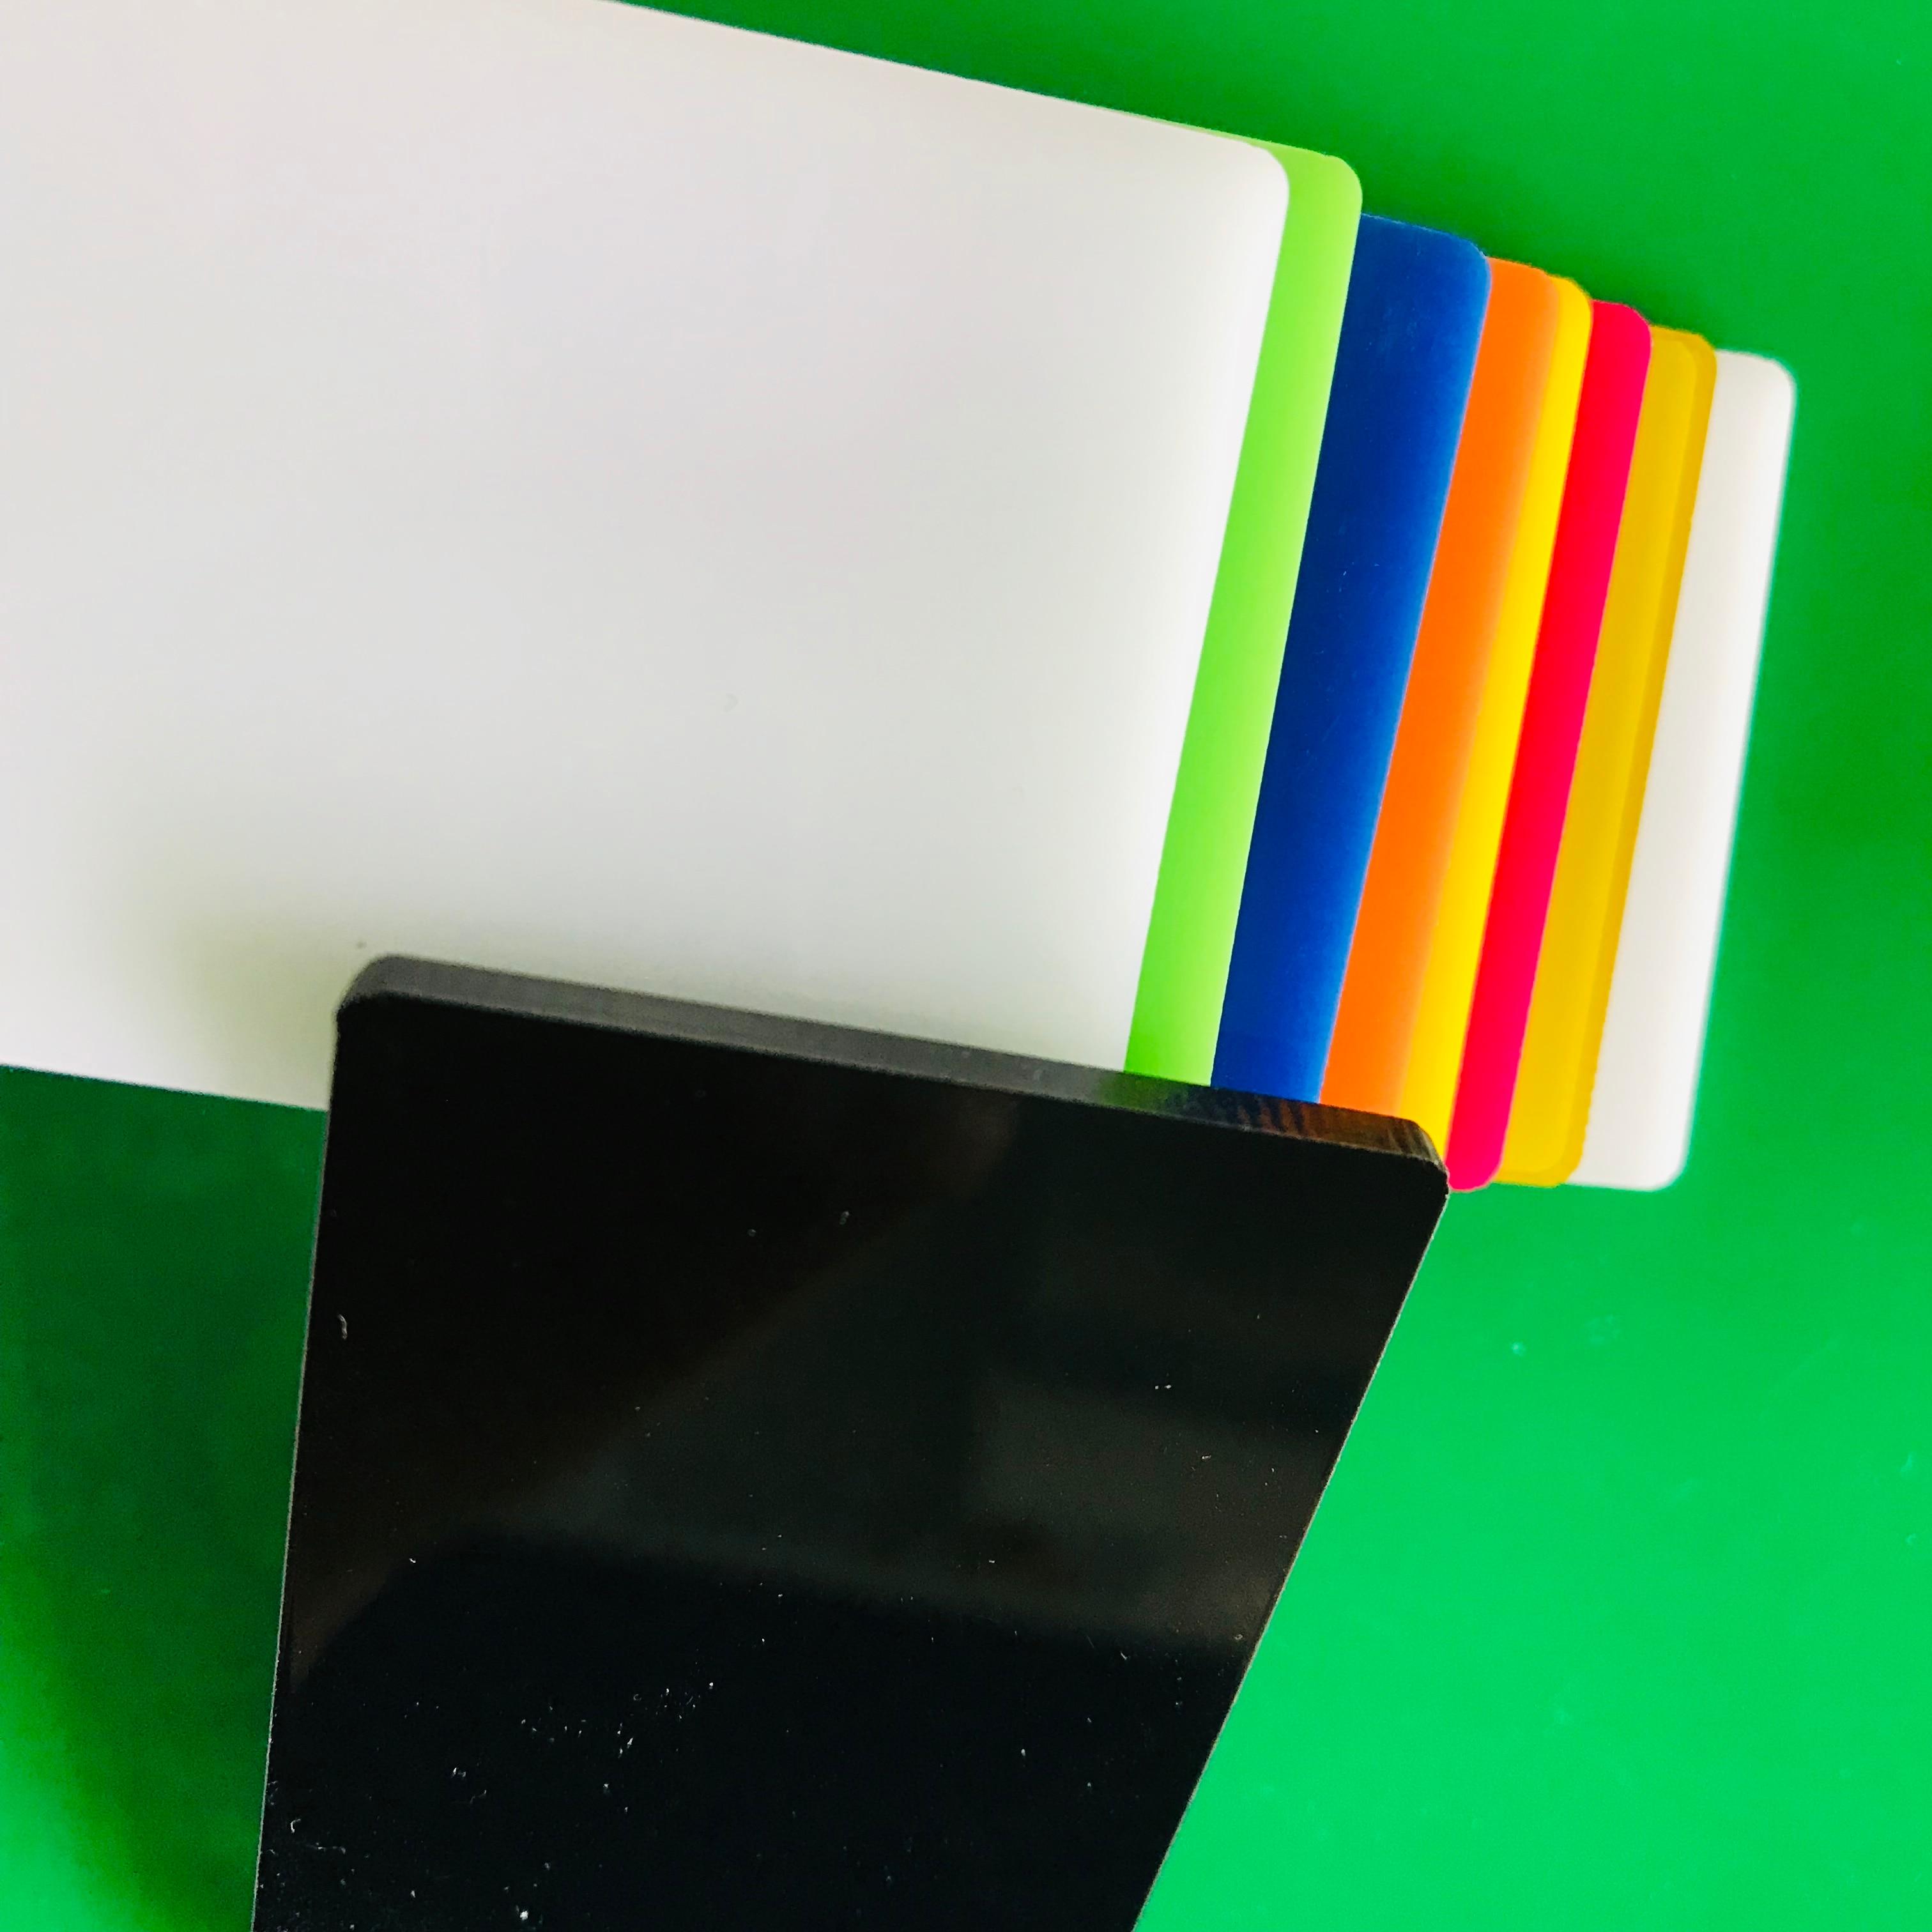 200x200x2mm 18 pieces black acrylic sheet plaque